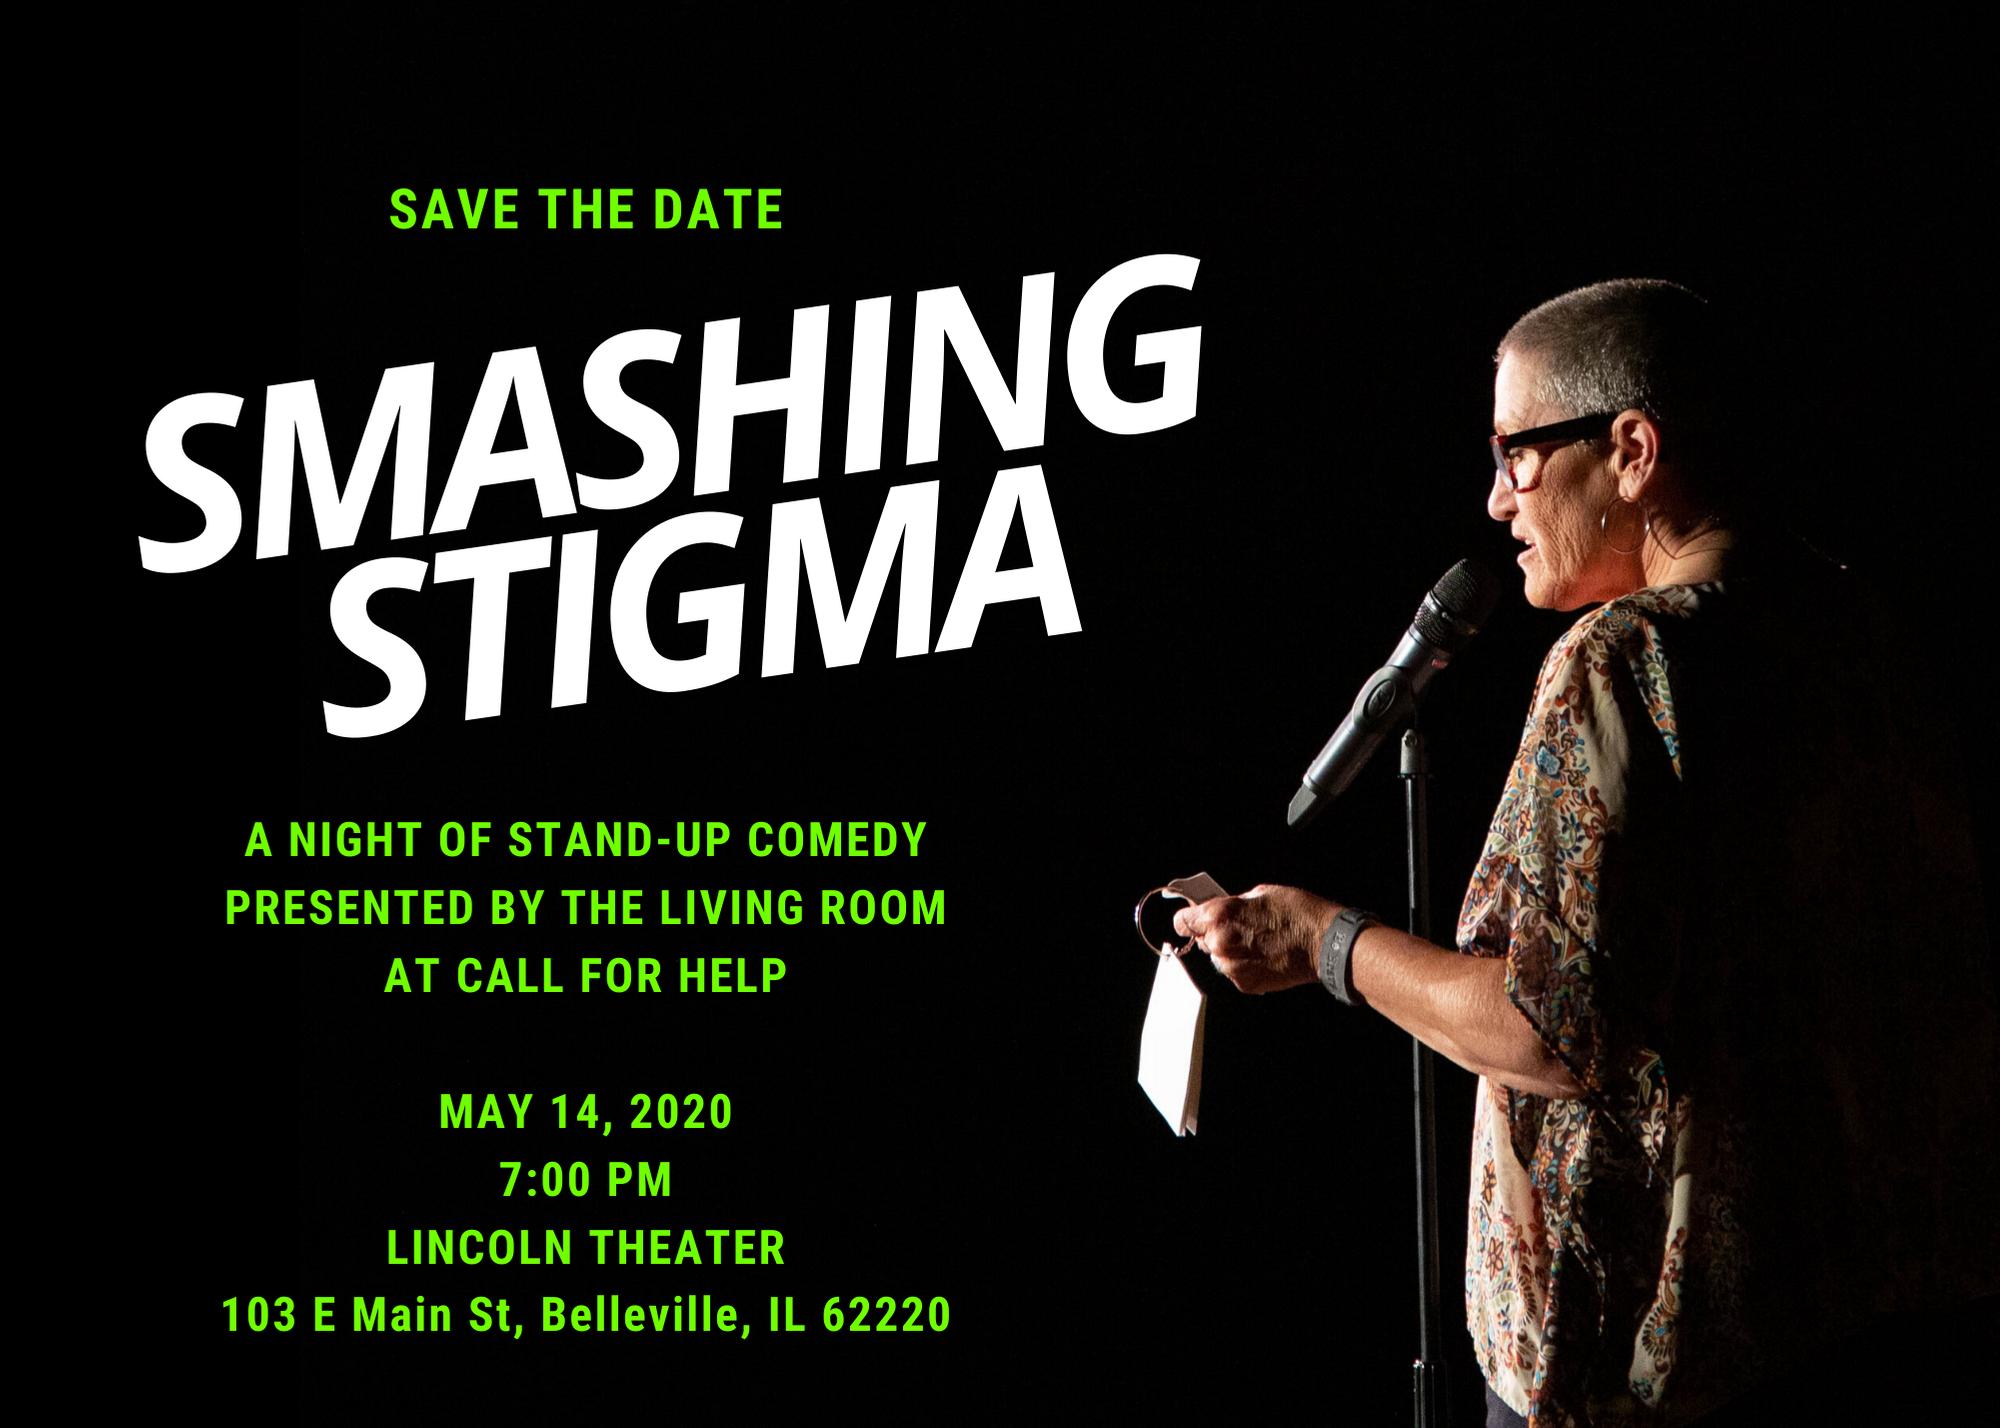 Smashing Stigma